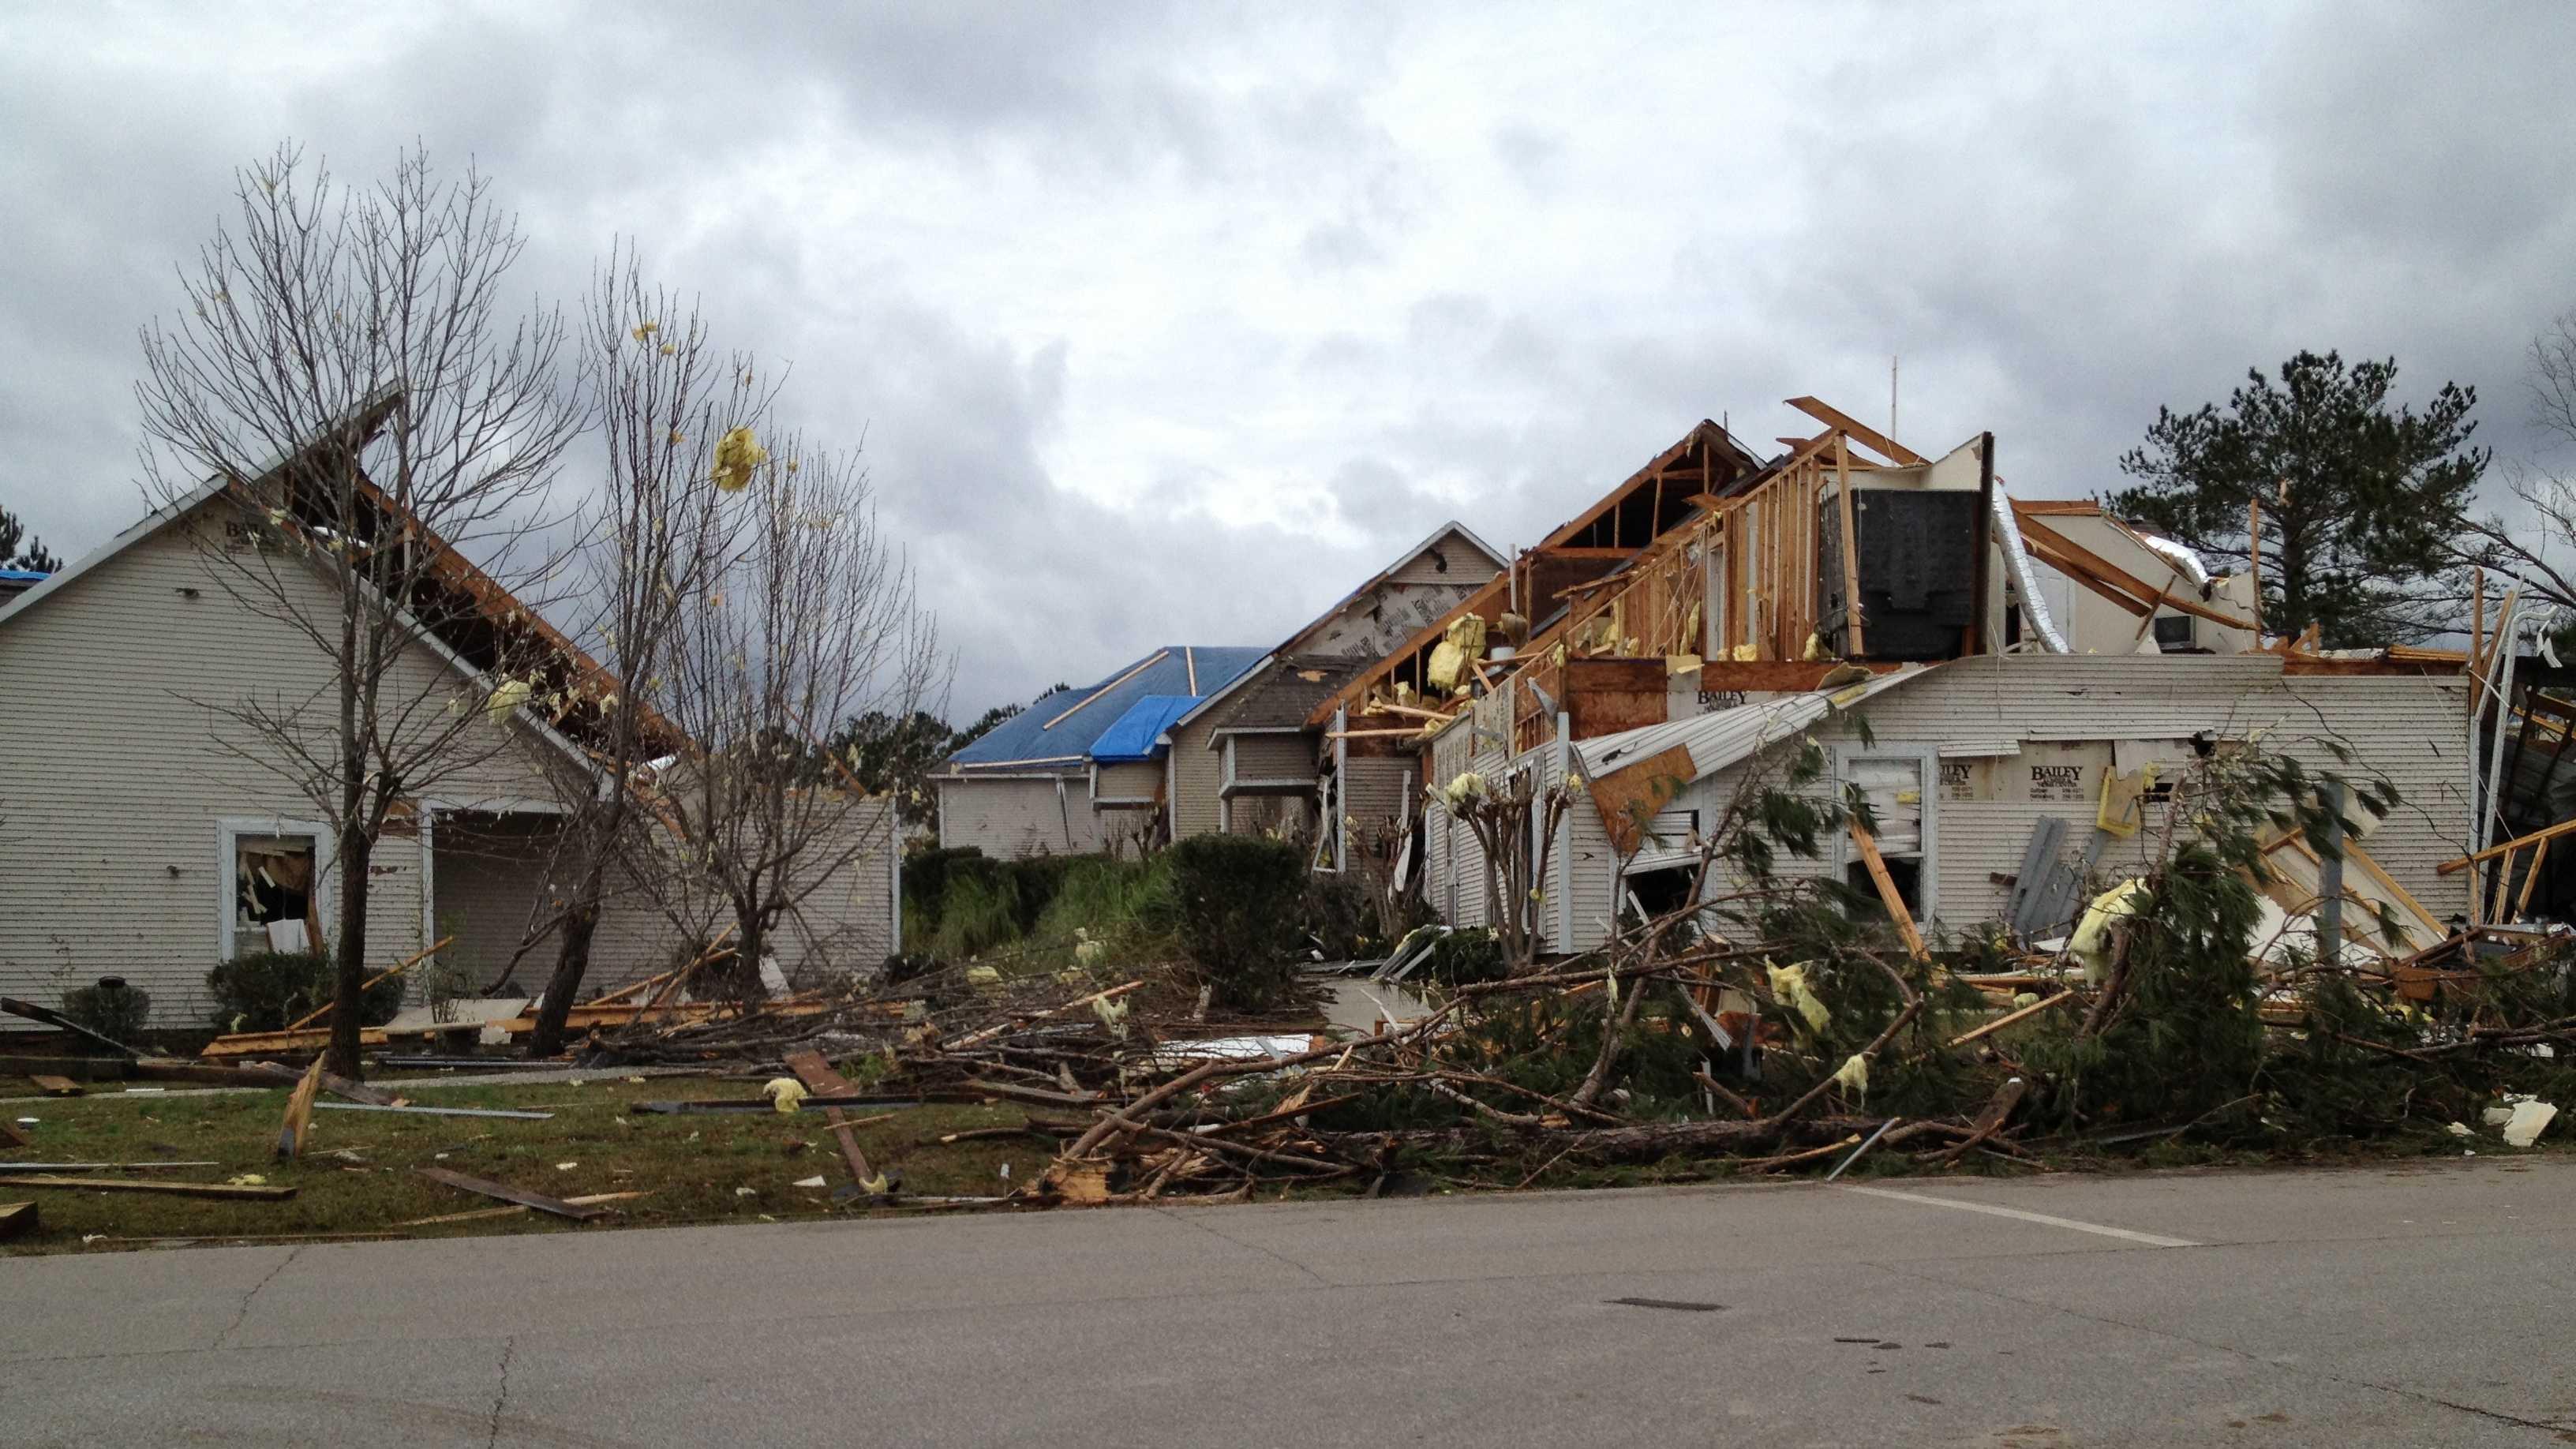 The Lakeshore subdivision in Lamar County saw major tornado damage.